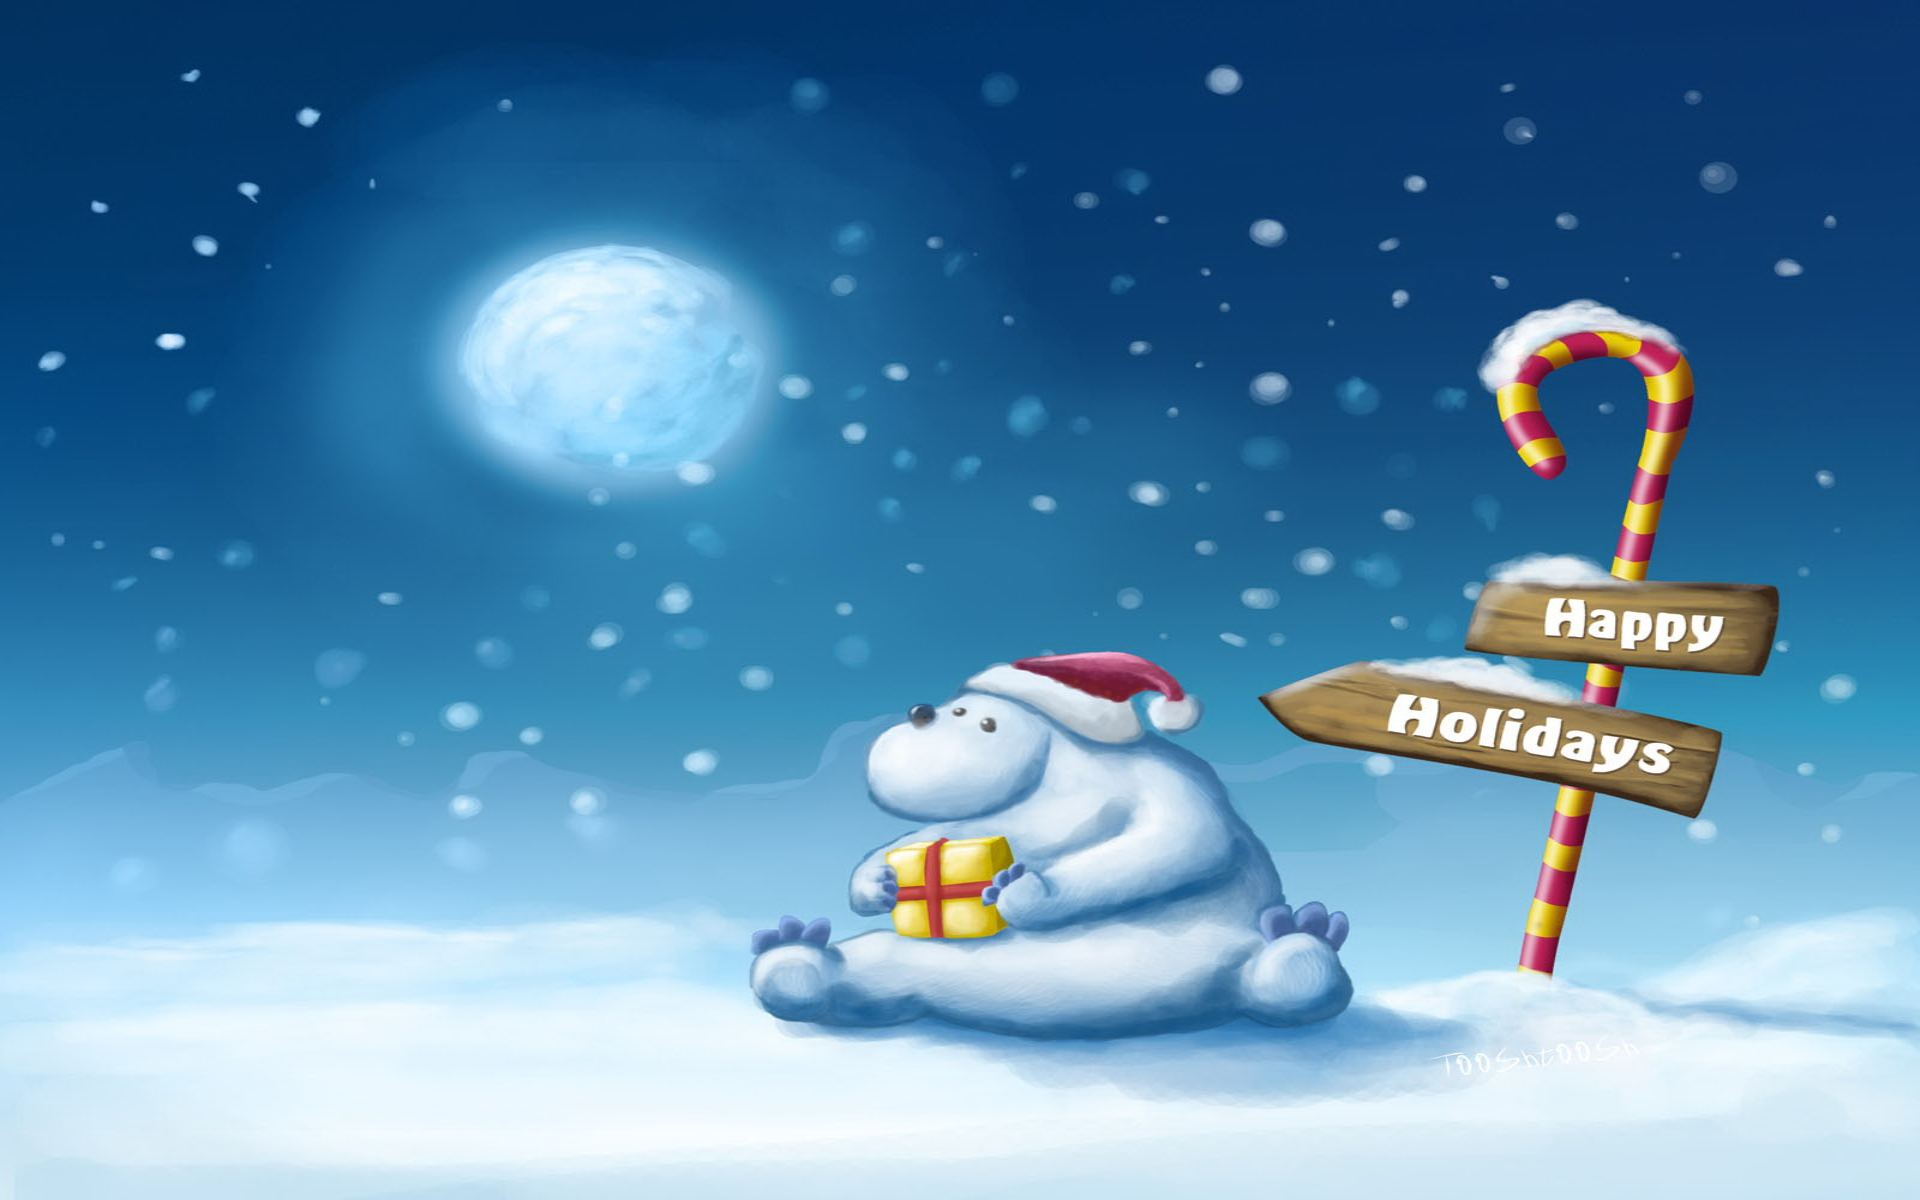 65 Winter Holiday Backgrounds On Wallpapersafari